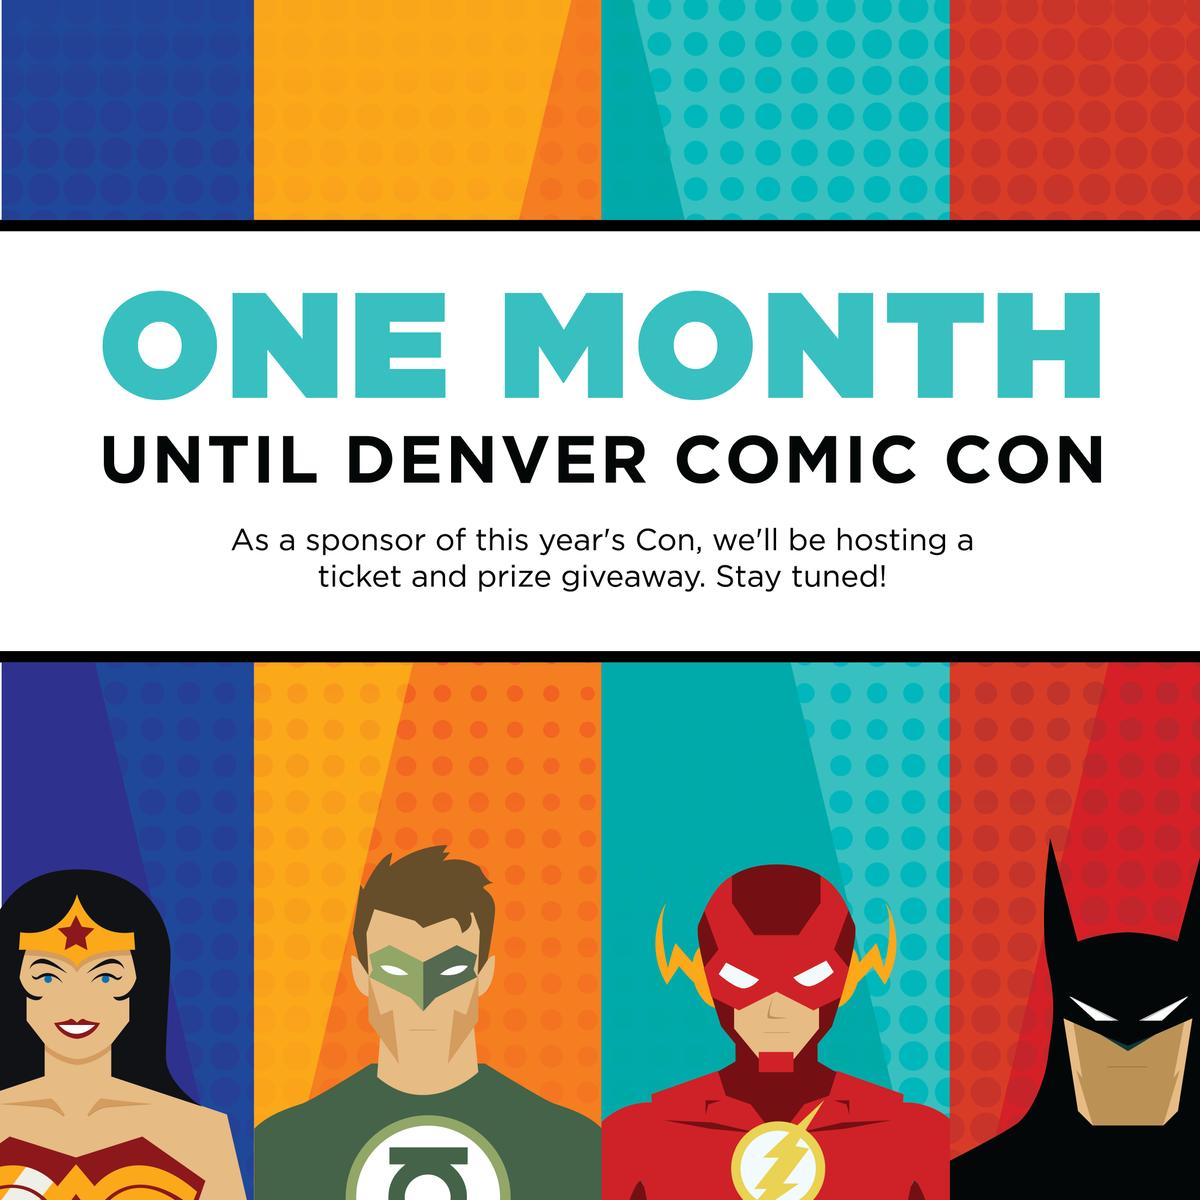 We can't wait for @denvercomiccon! Fun stuff is in the works... #RMCAD #denvercomiccon #comiccon https://t.co/cAMsQXILur